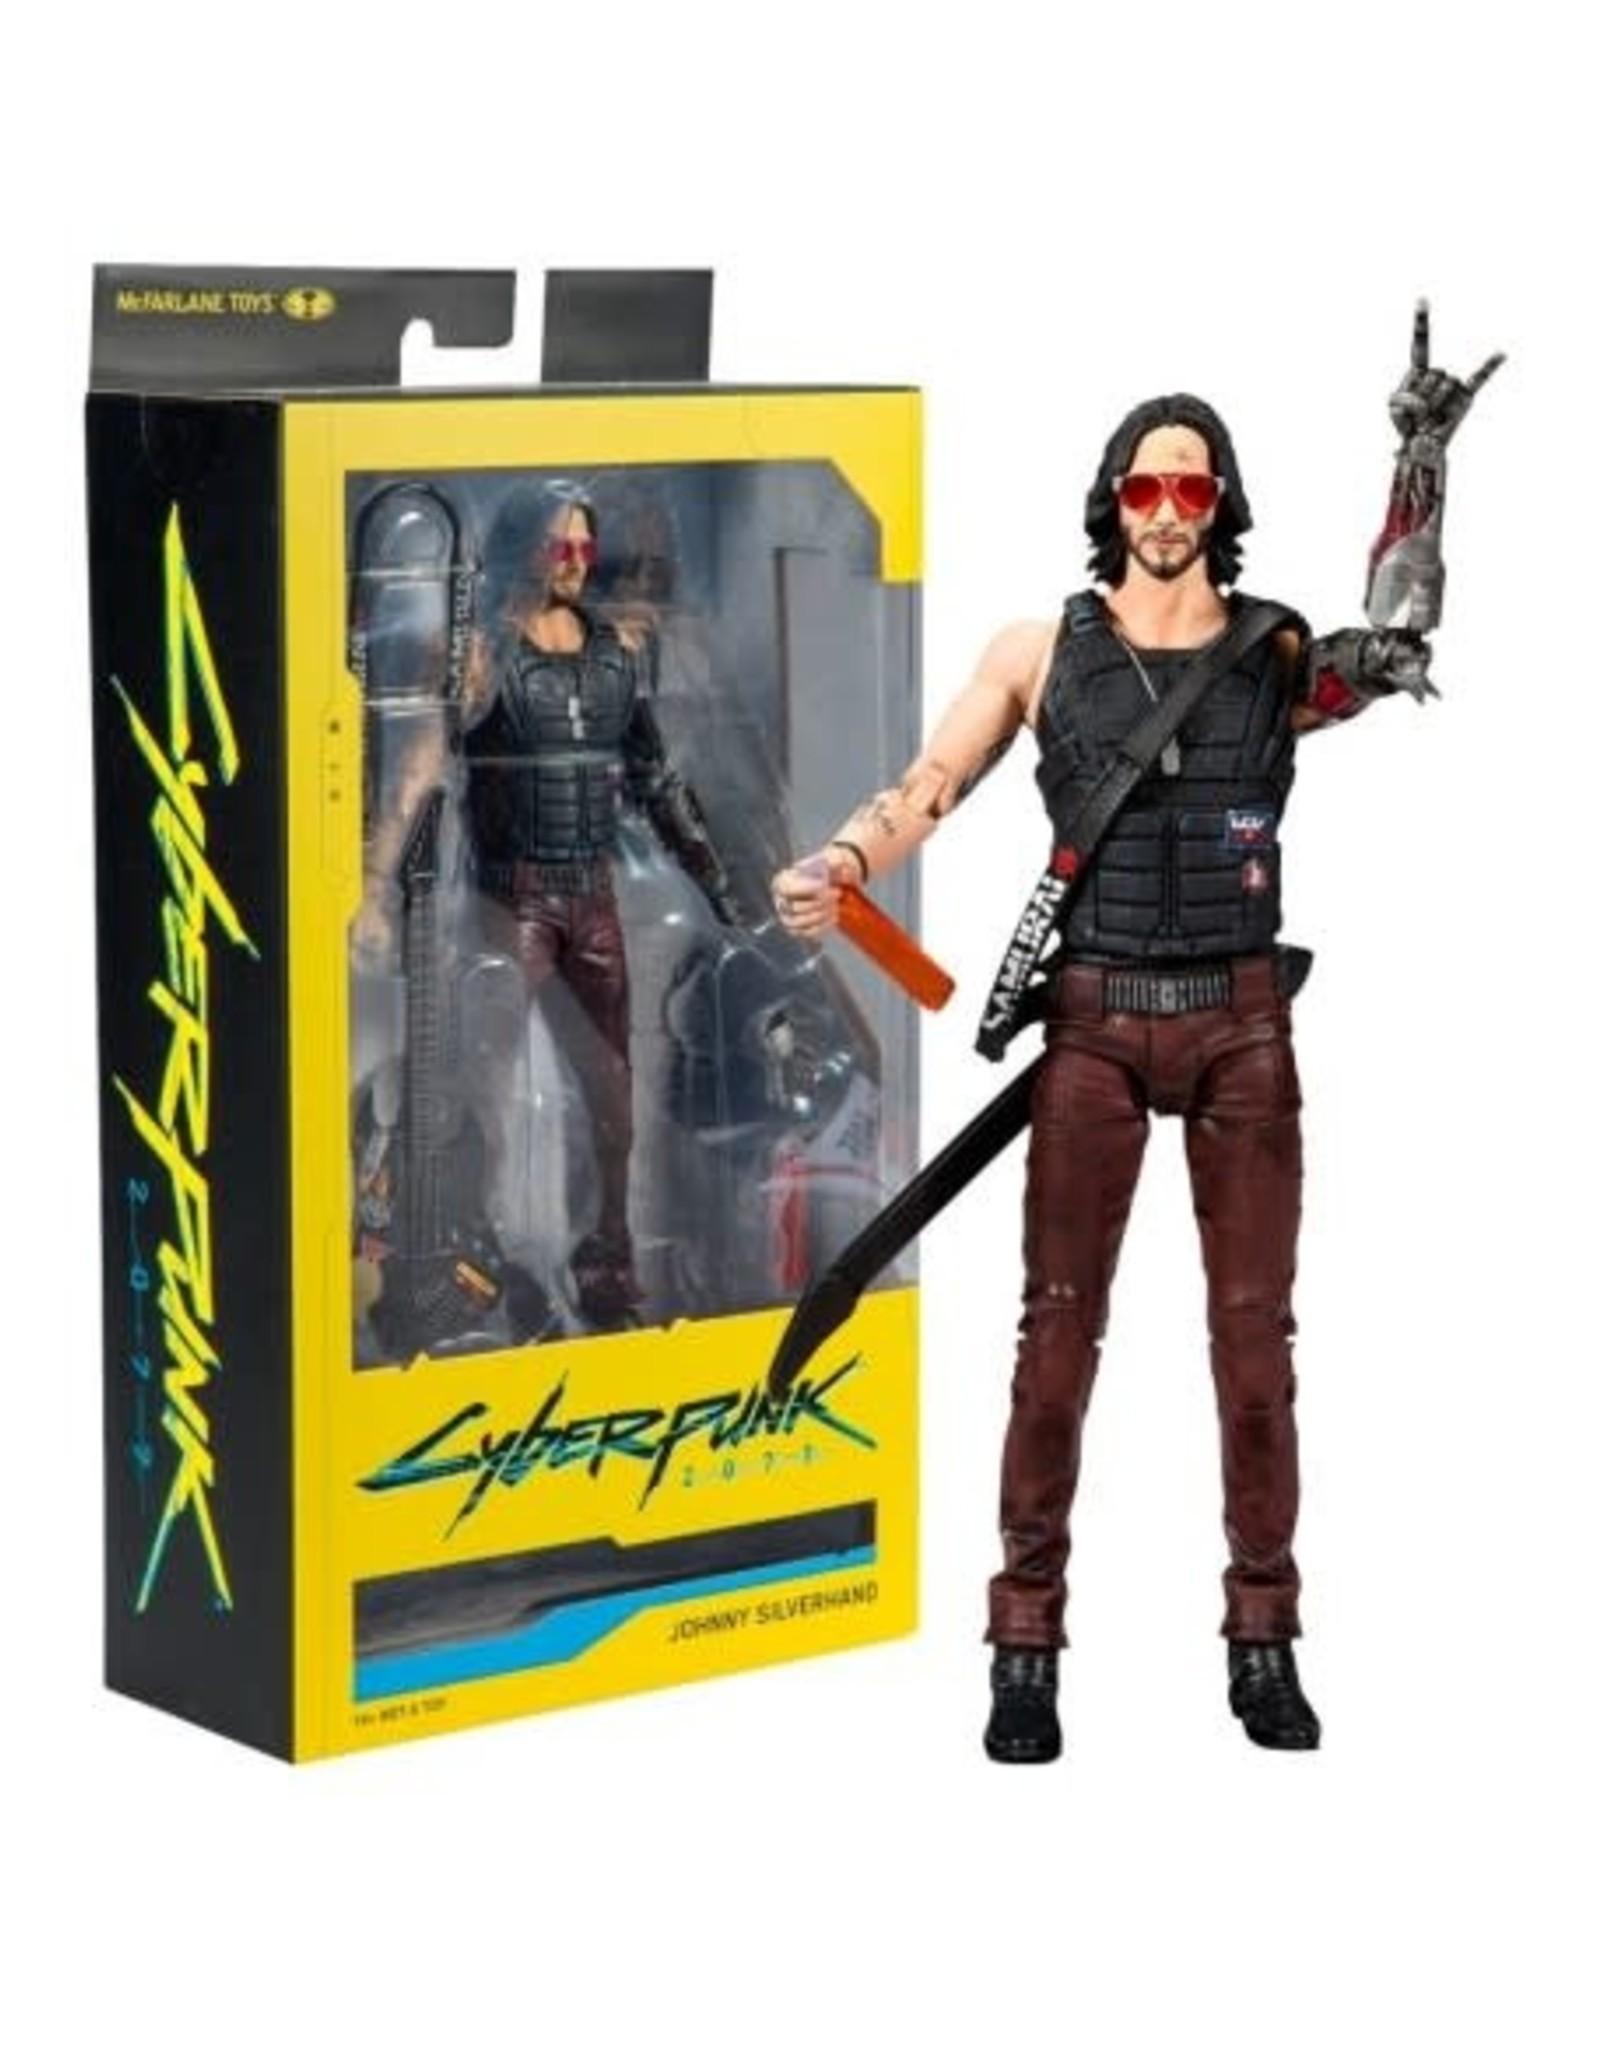 CYBERPUNK 2077 - Action Figure 18cm - Johnny Silverhands